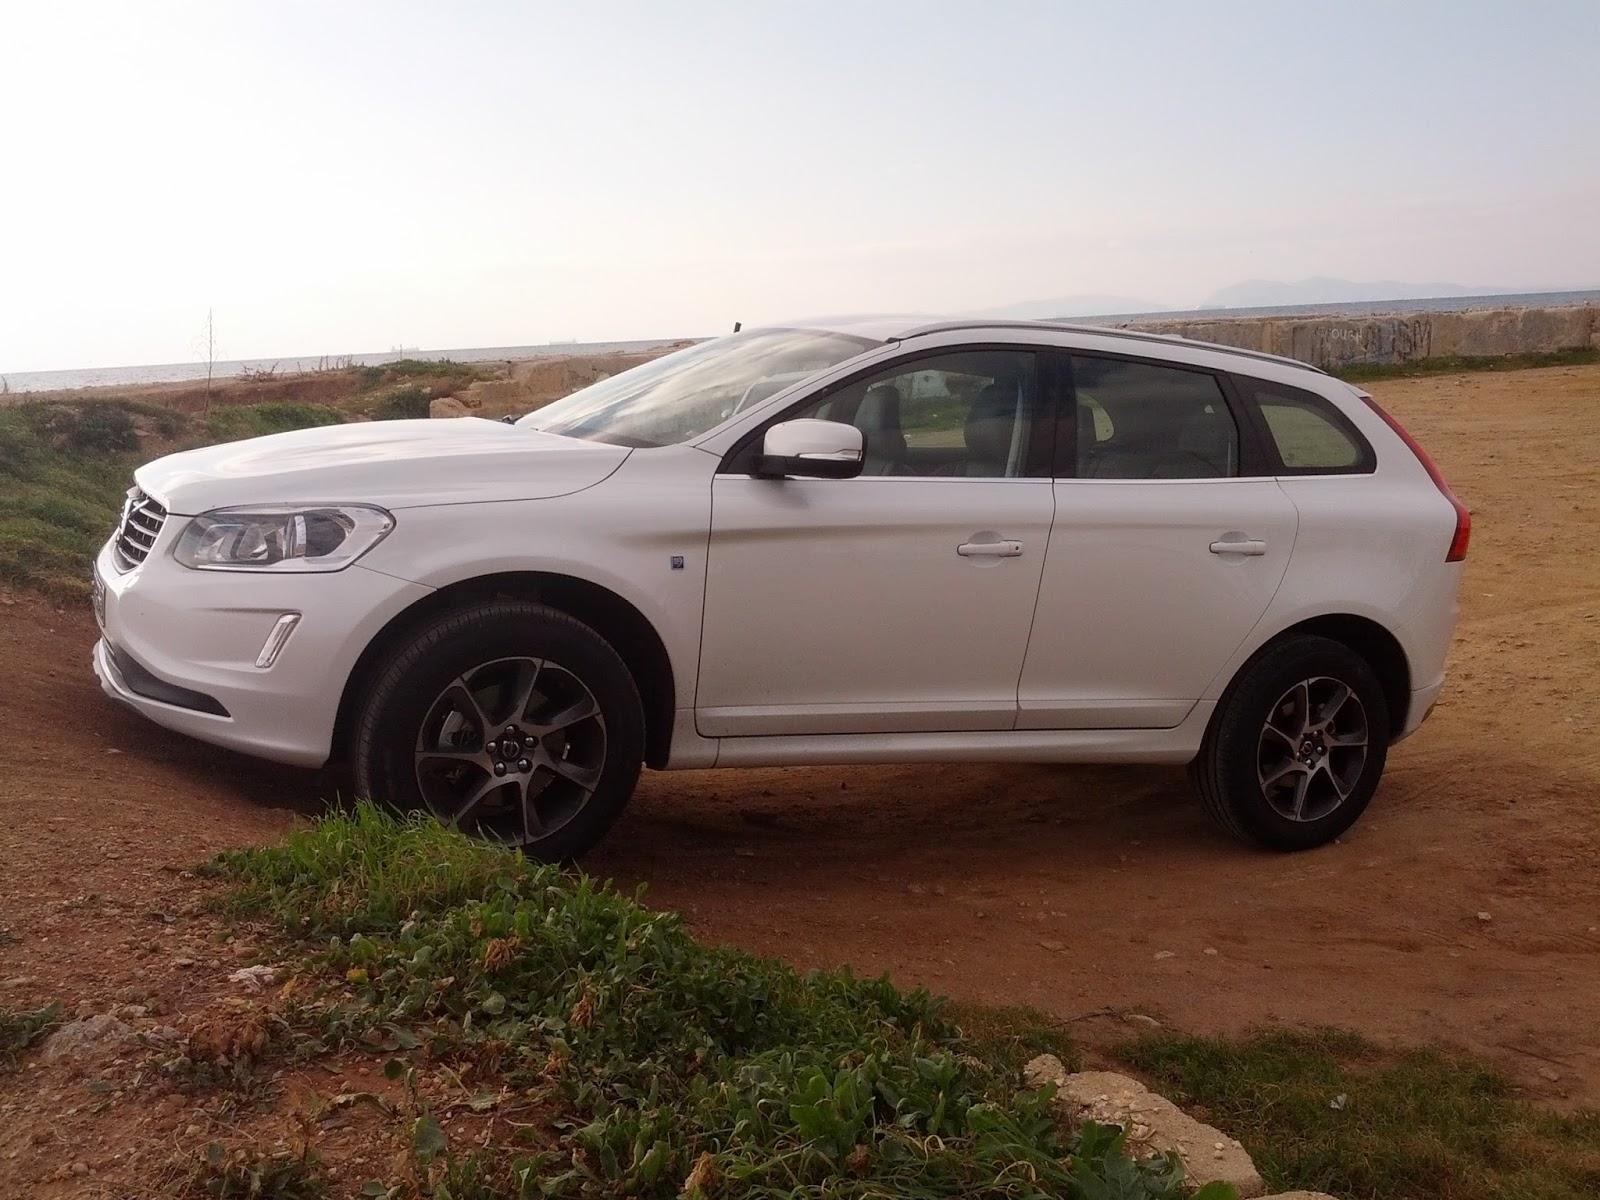 IMG 20151209 142502 Γιατί το Volvo XC60 είναι εθιστικό